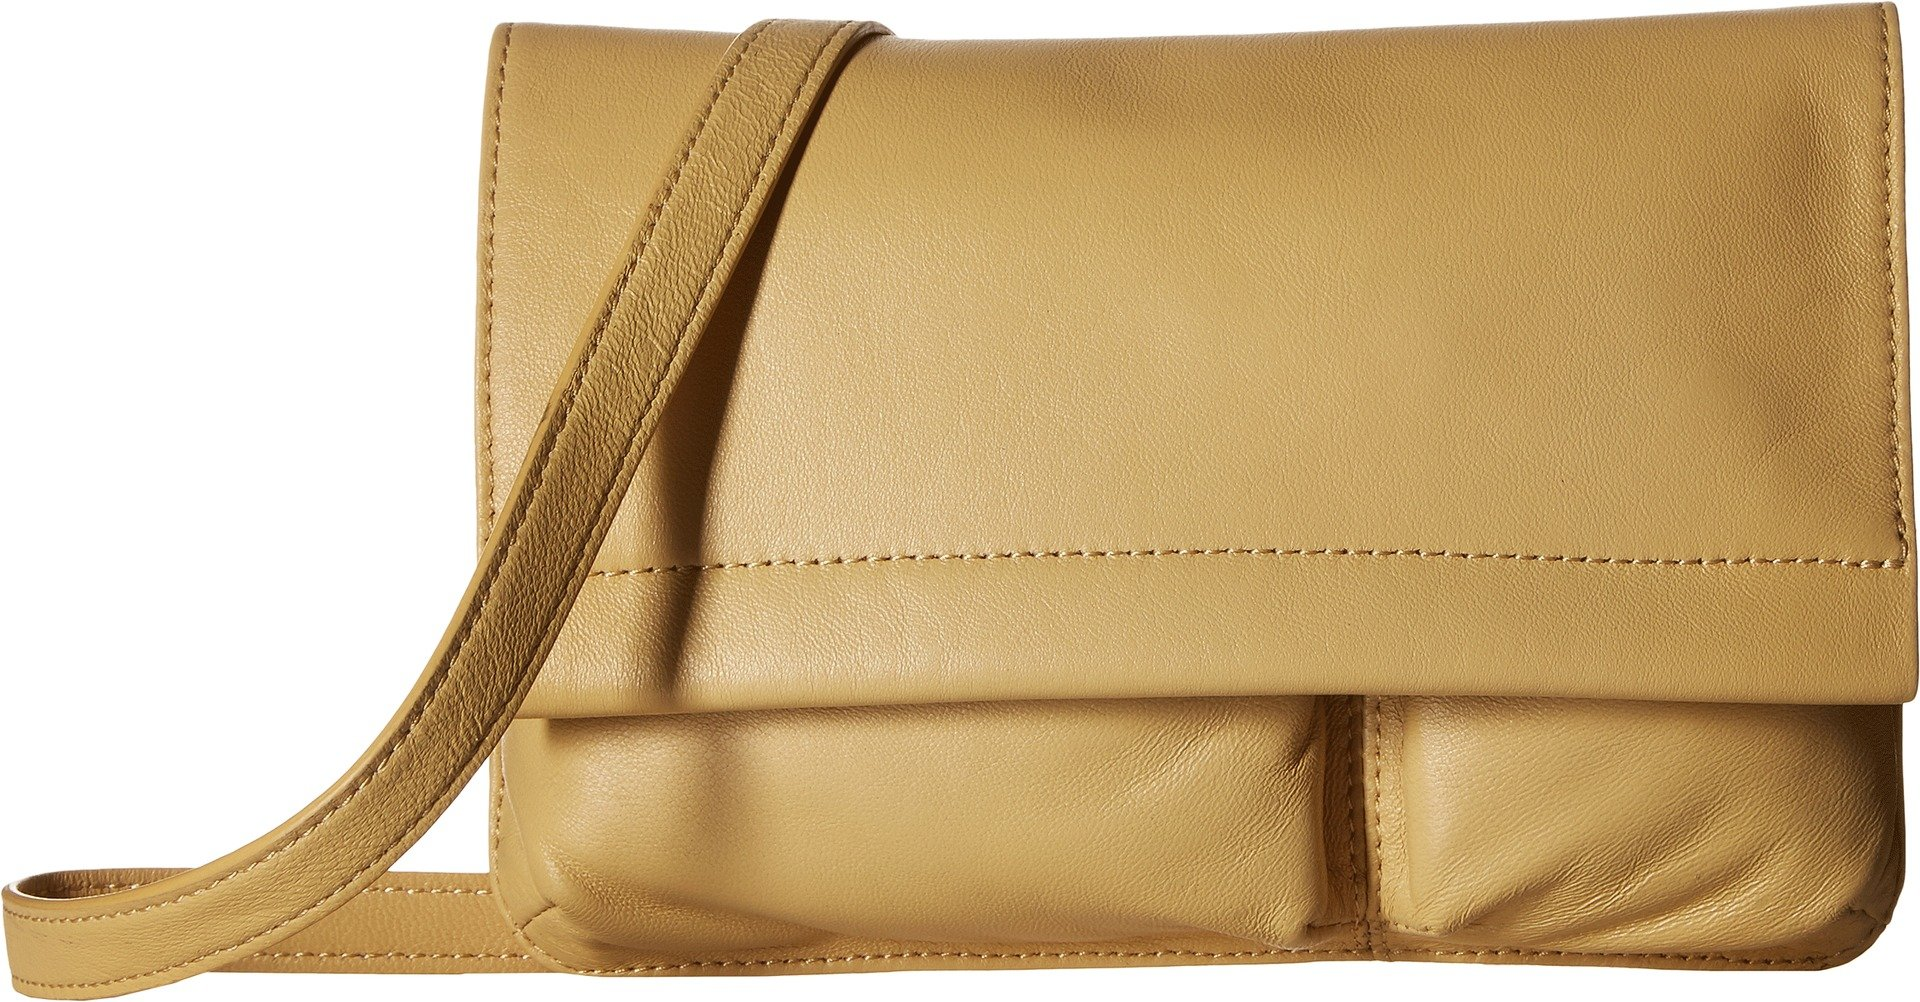 Kooba Women's Belize Convertible Belt Bag Sunset One Size